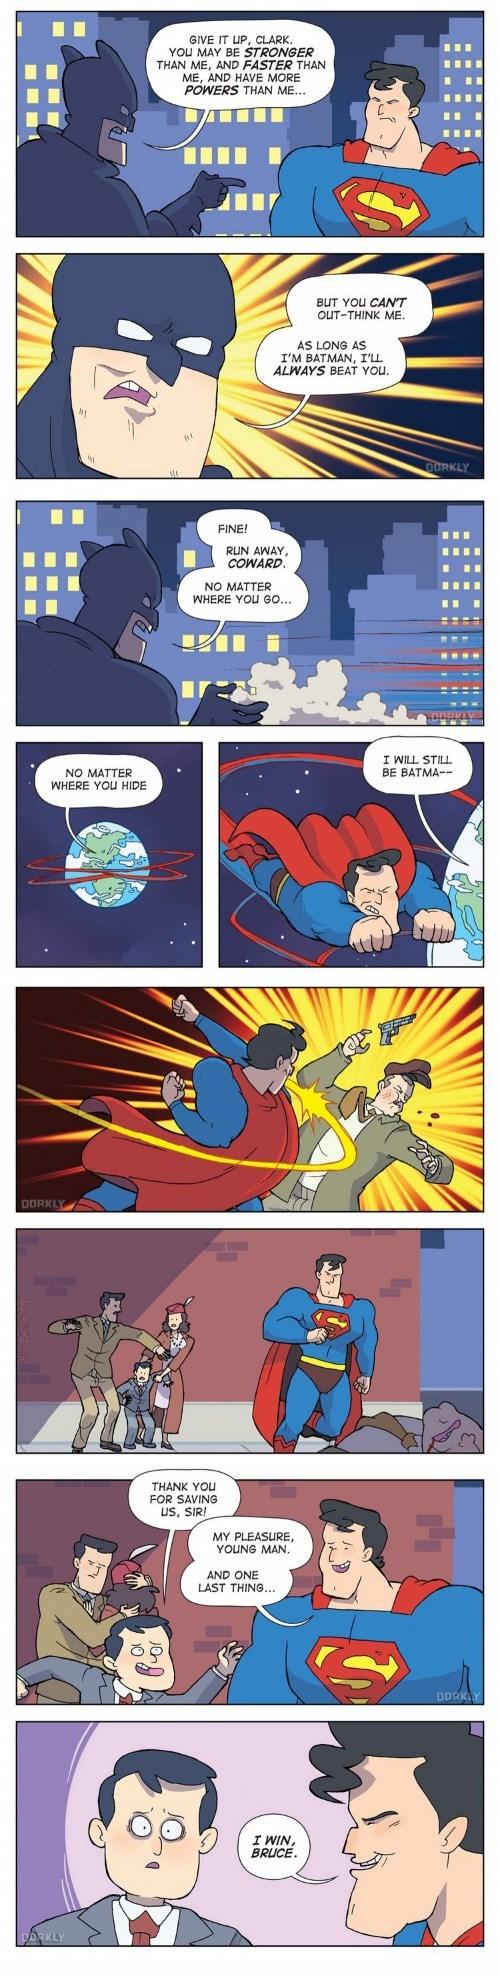 batman vs superman,time travel,web comics